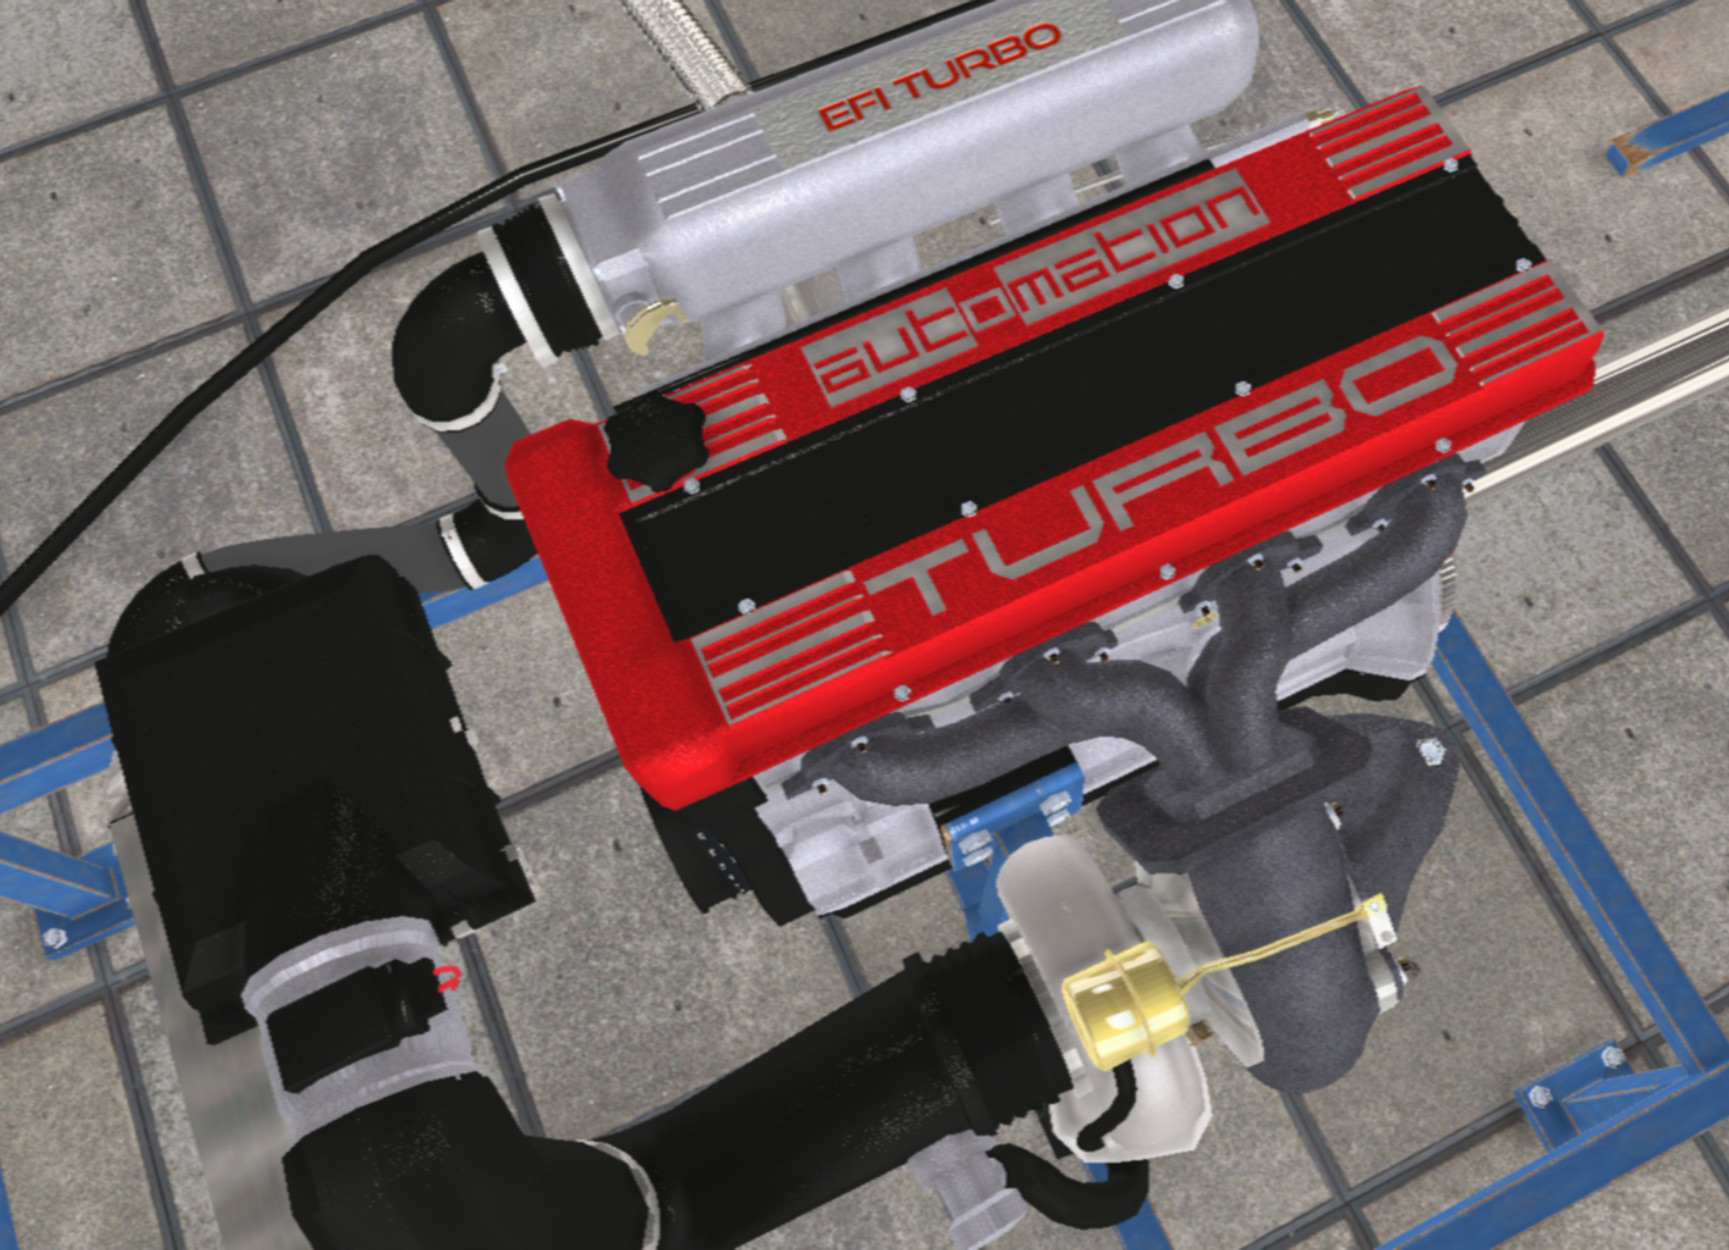 Engine Turbo Build Game Engine Free Engine Image For